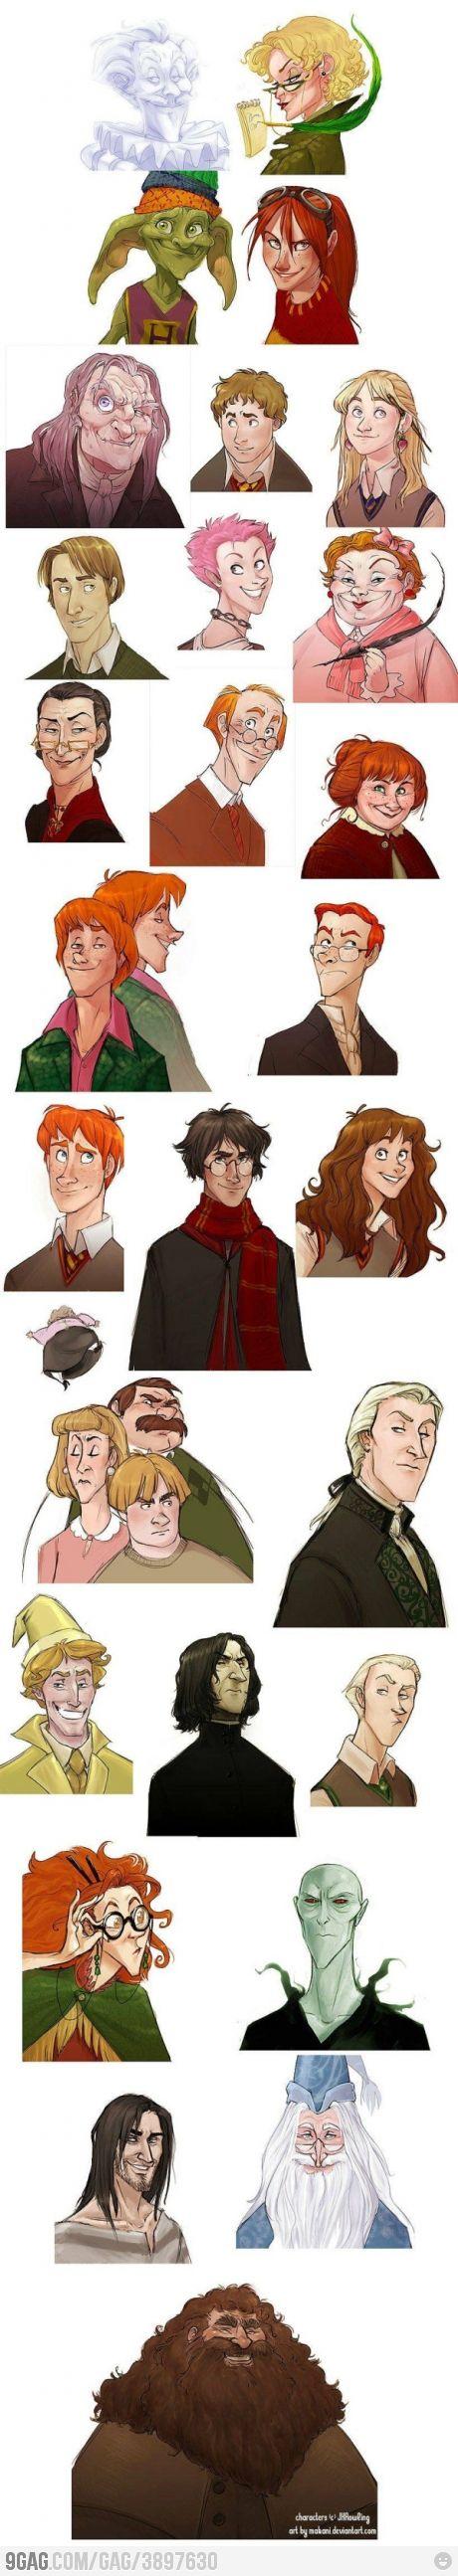 Harry Potter as a Disney movie.